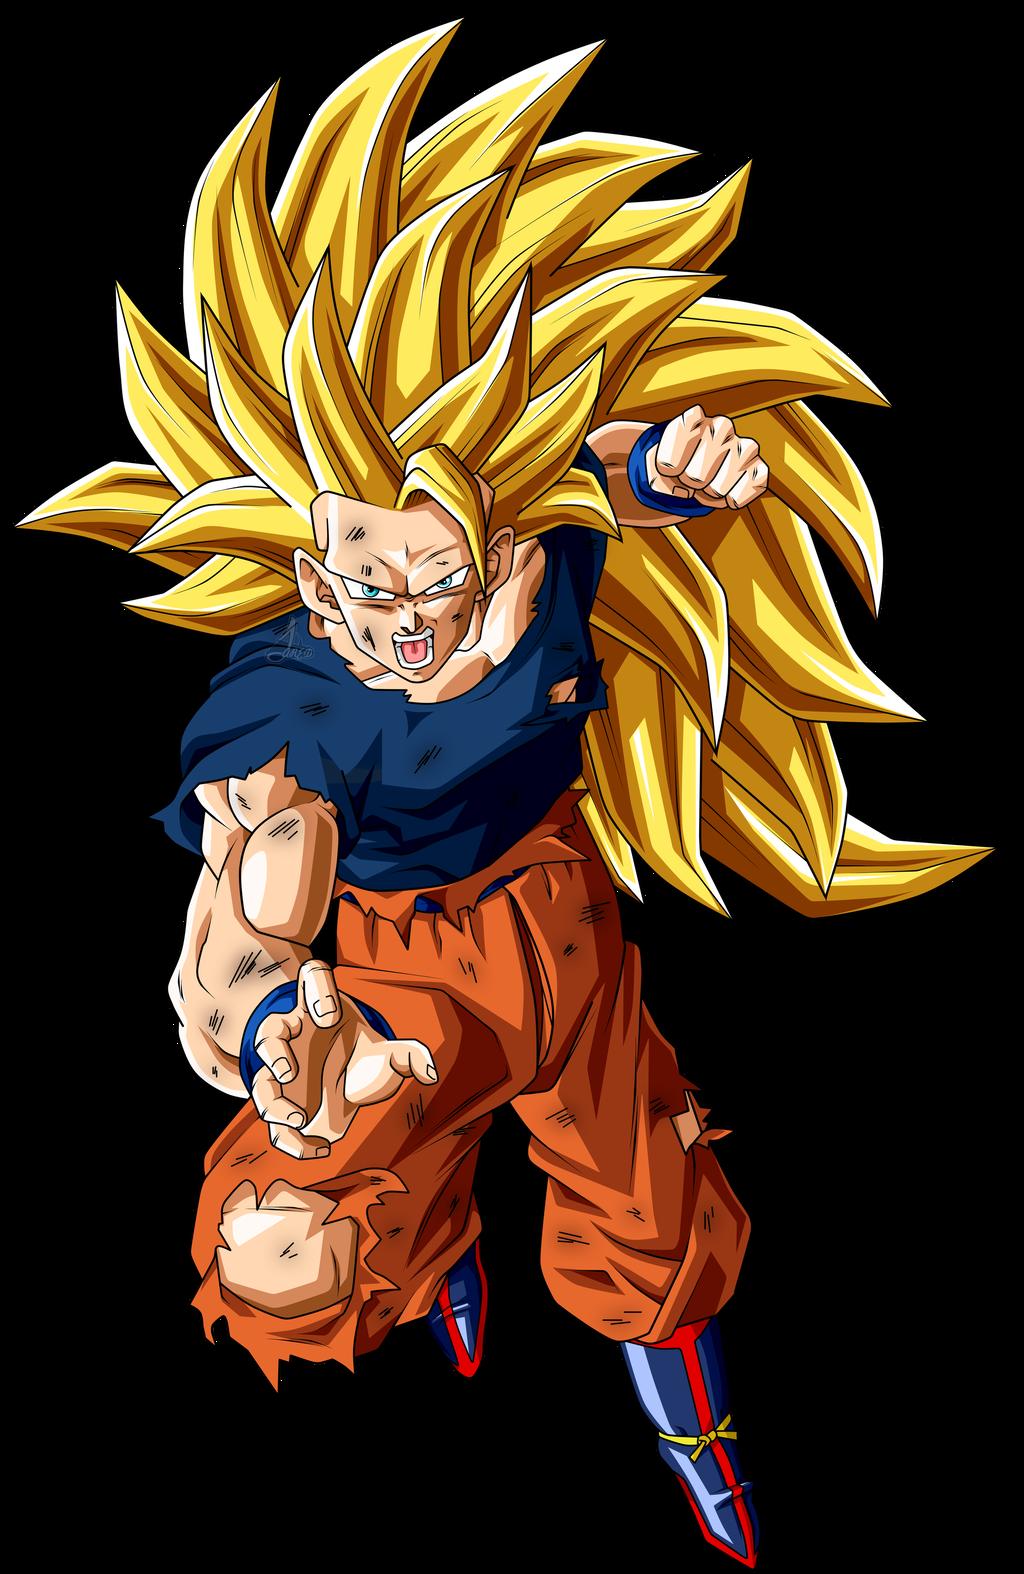 Goku Ssj Fase 3 Herido Dbs By Jaredsongohan Dragon Ball Super Manga Anime Dragon Ball Super Dragon Ball